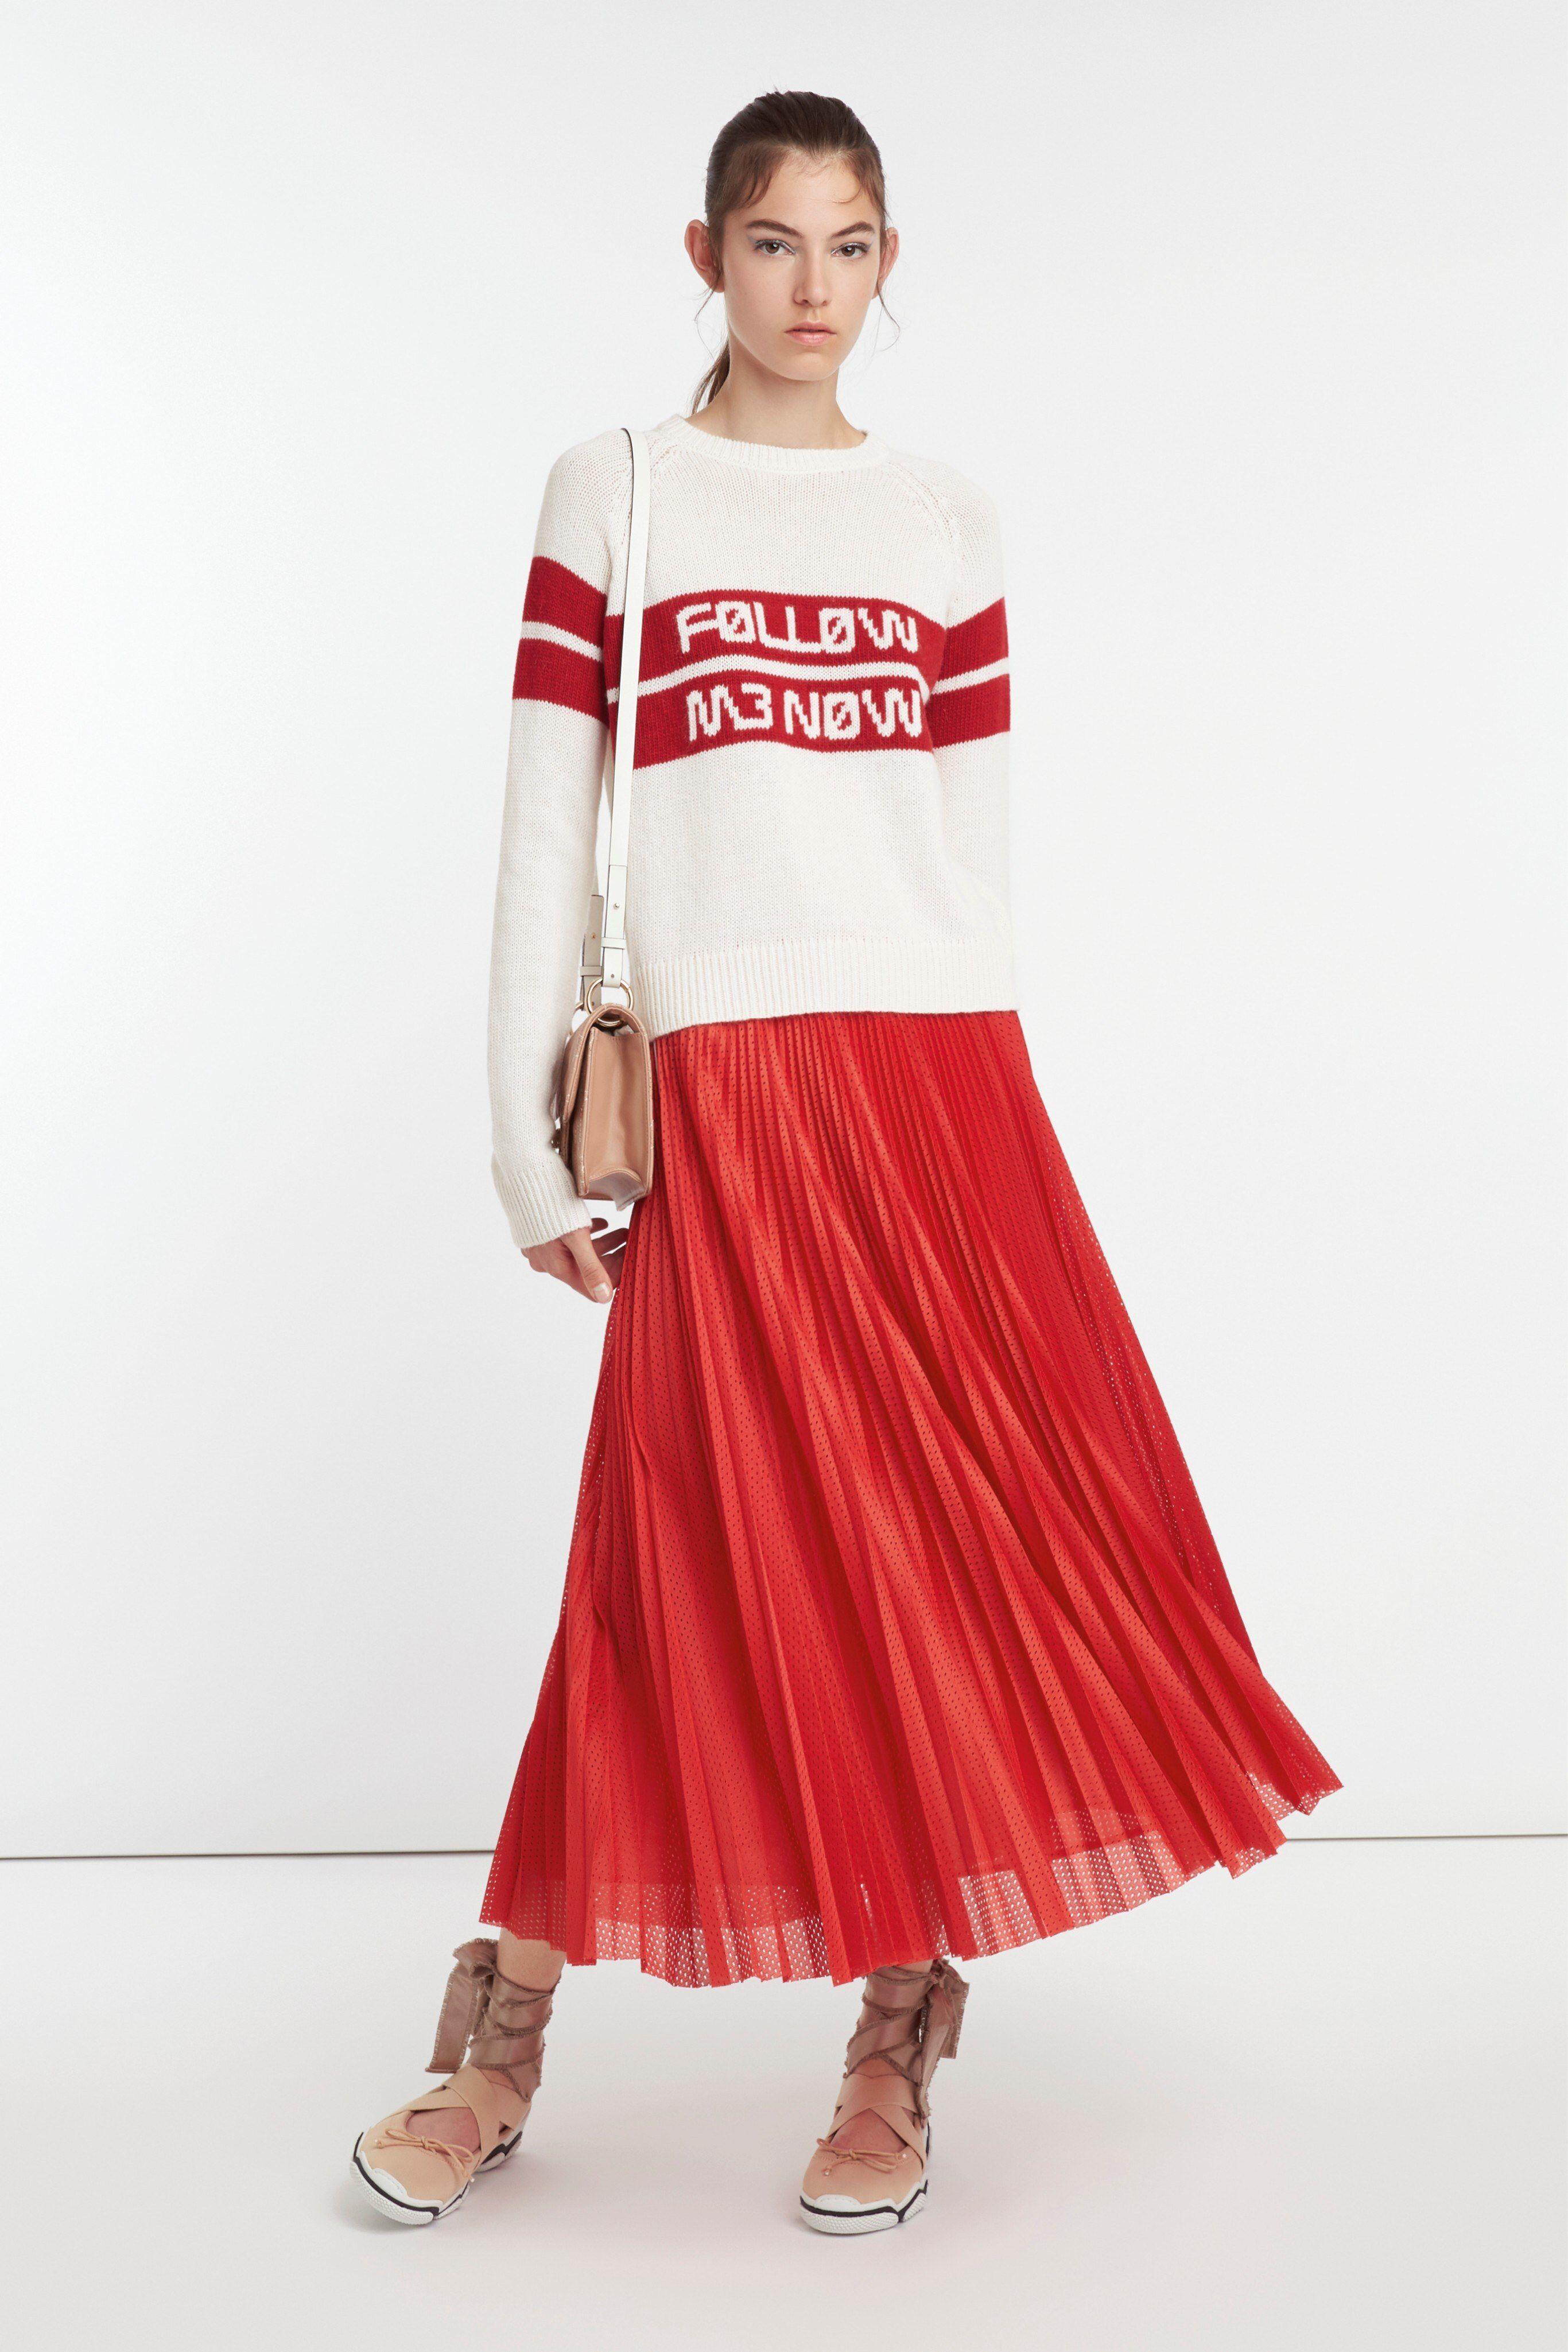 RED Valentino SpringSummer 2019 Collection – New York Fashion Week